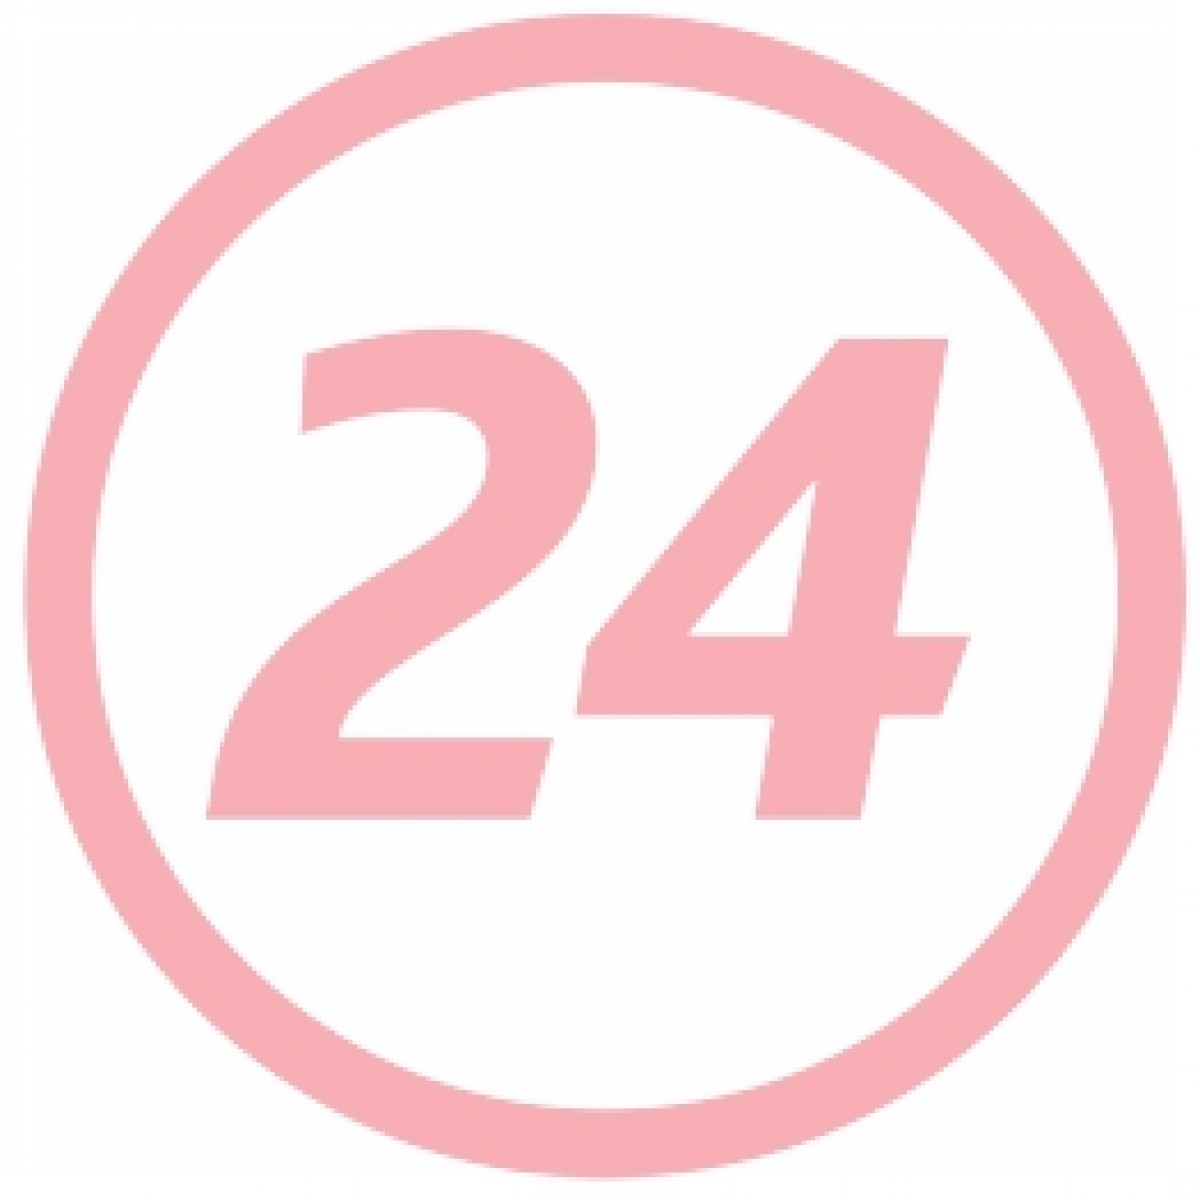 Pudra Minerala Promise 5.3 Alva Green, 2,25g